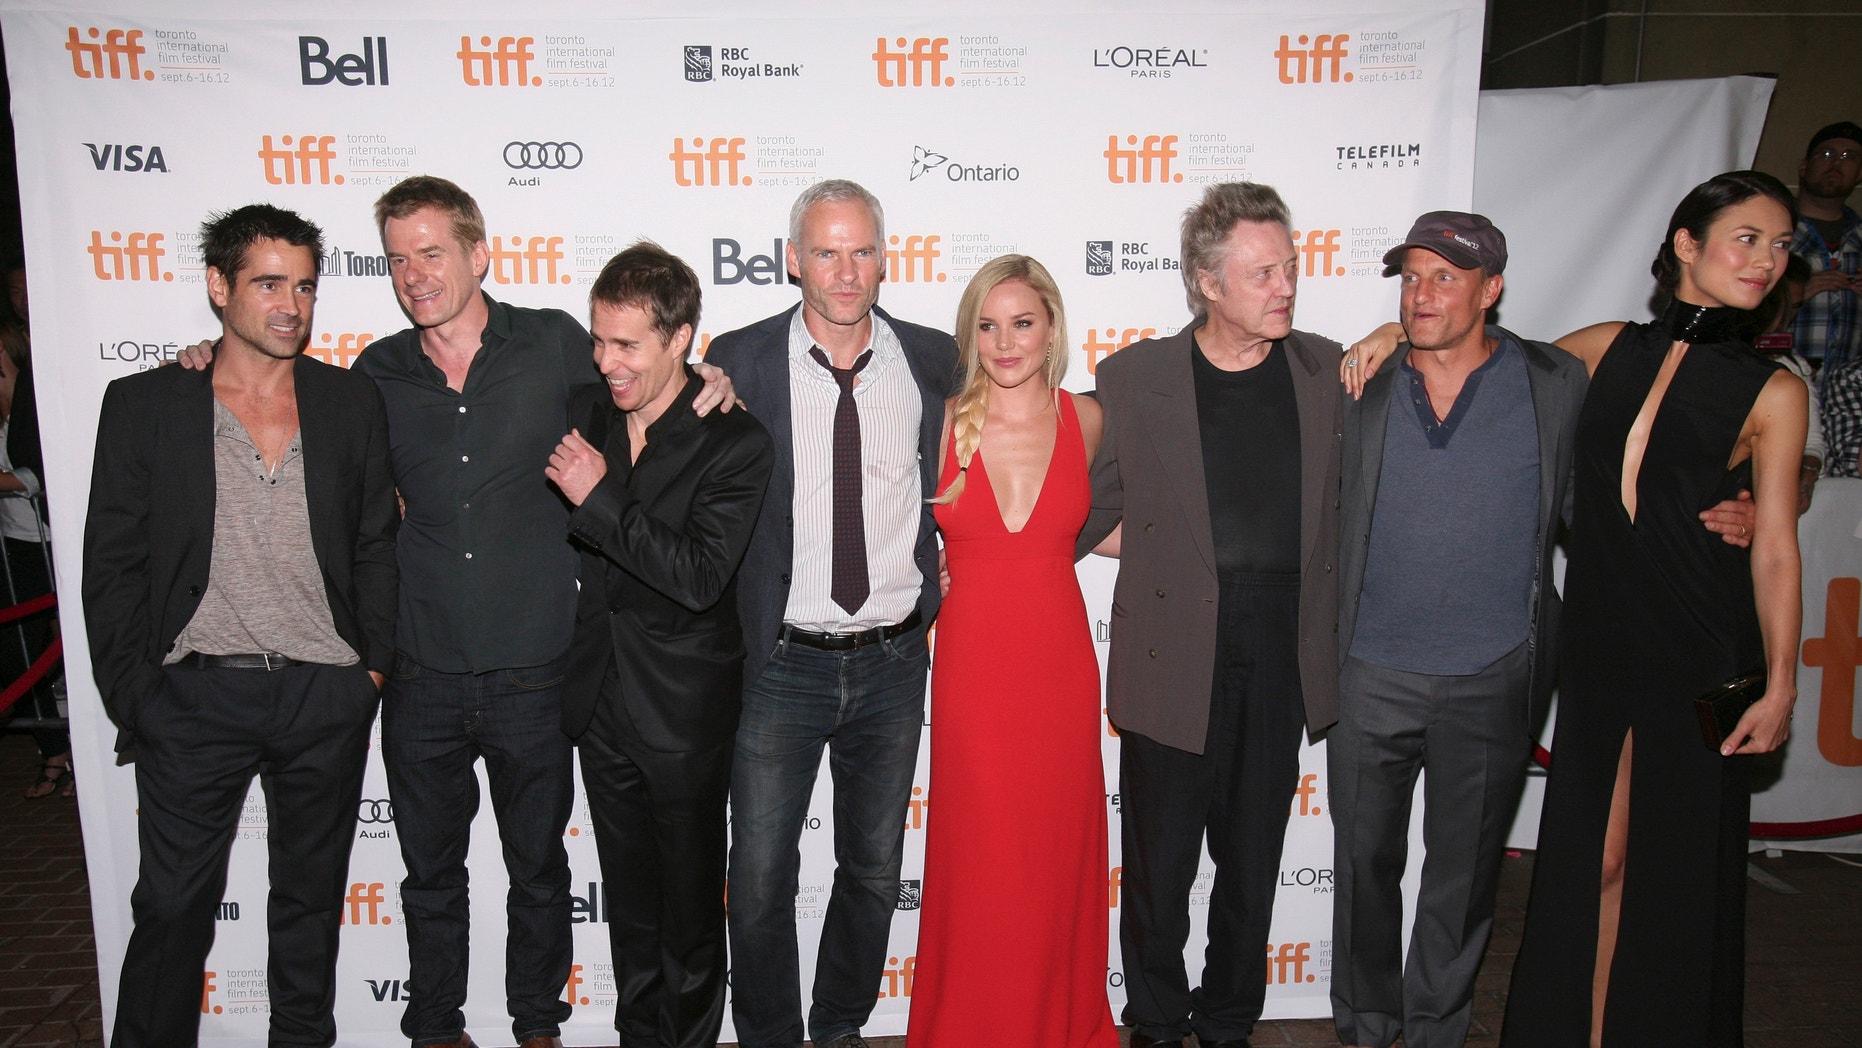 "(L to R) Colin Farrell, Graham Broadbent, Sam Rockwell, Martin McDonagh, Abbie Cornish, Christopher Walken, Woody Harrelson, and Olga Kurylenko, at the ""Seven Psychopaths"" premiere in Toronto."